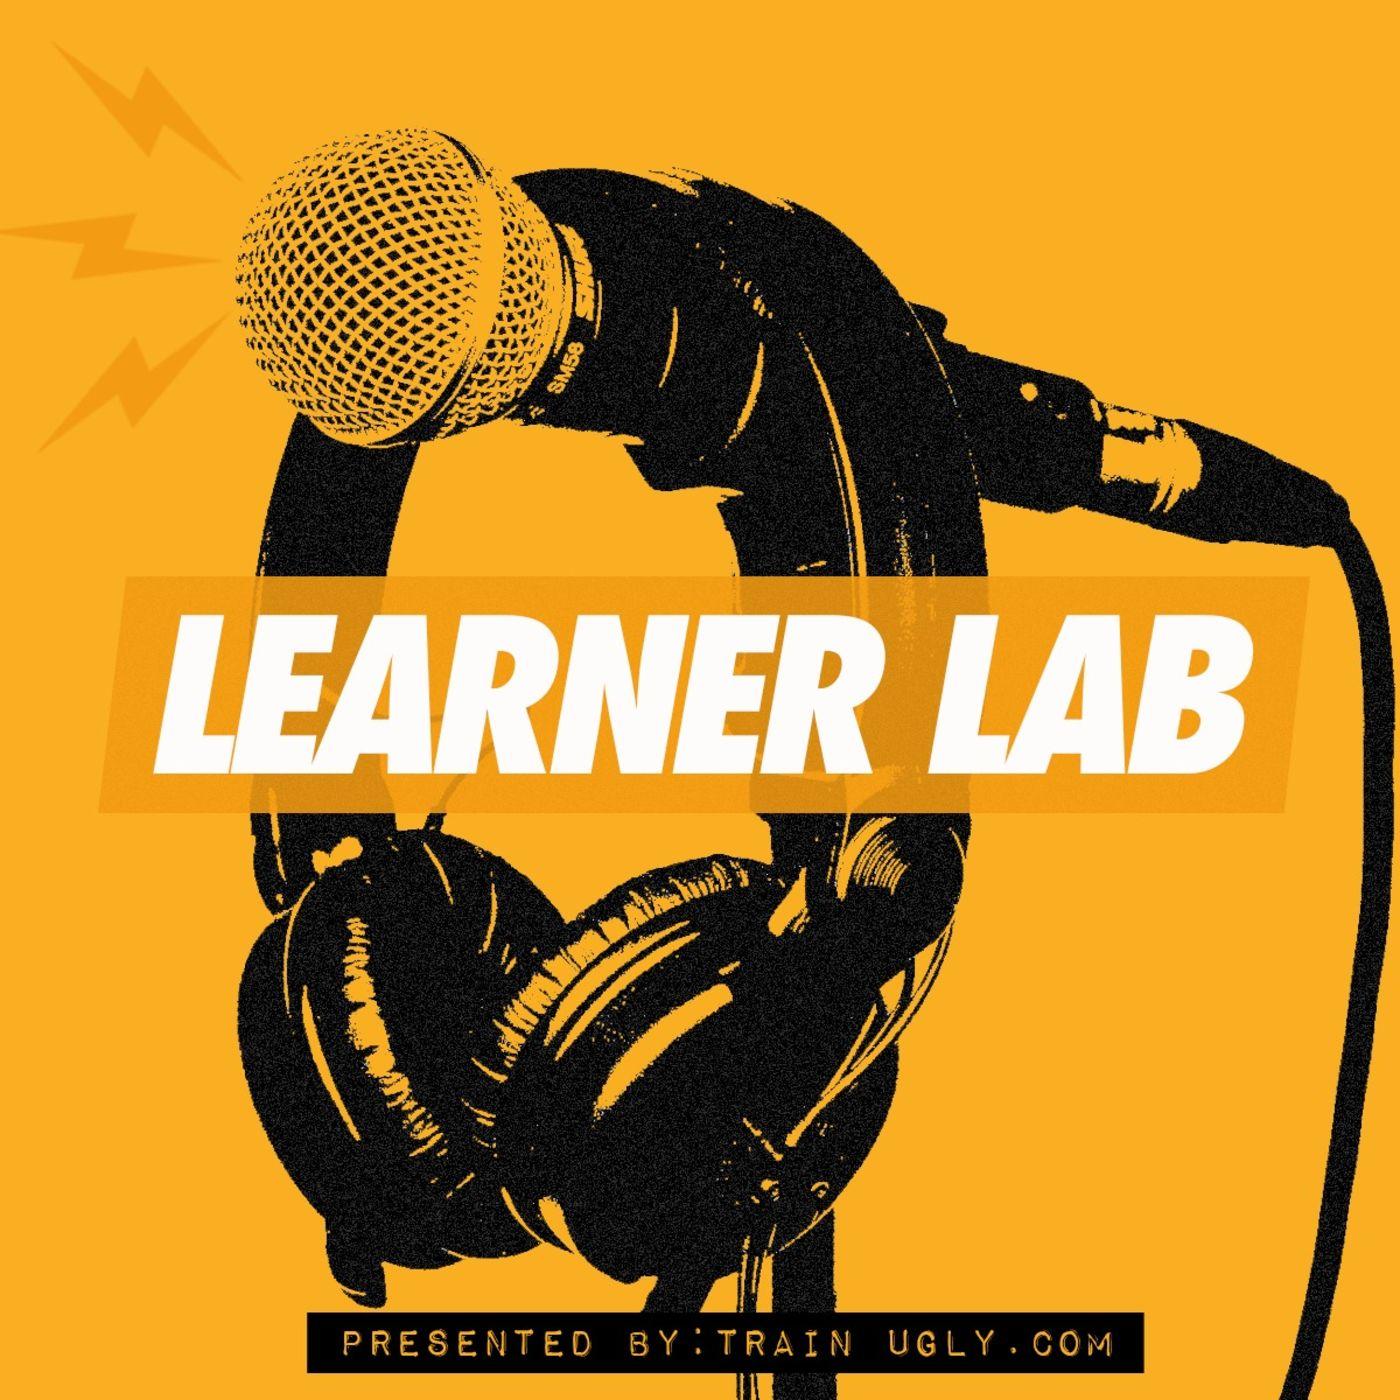 Learner Lab Trailer